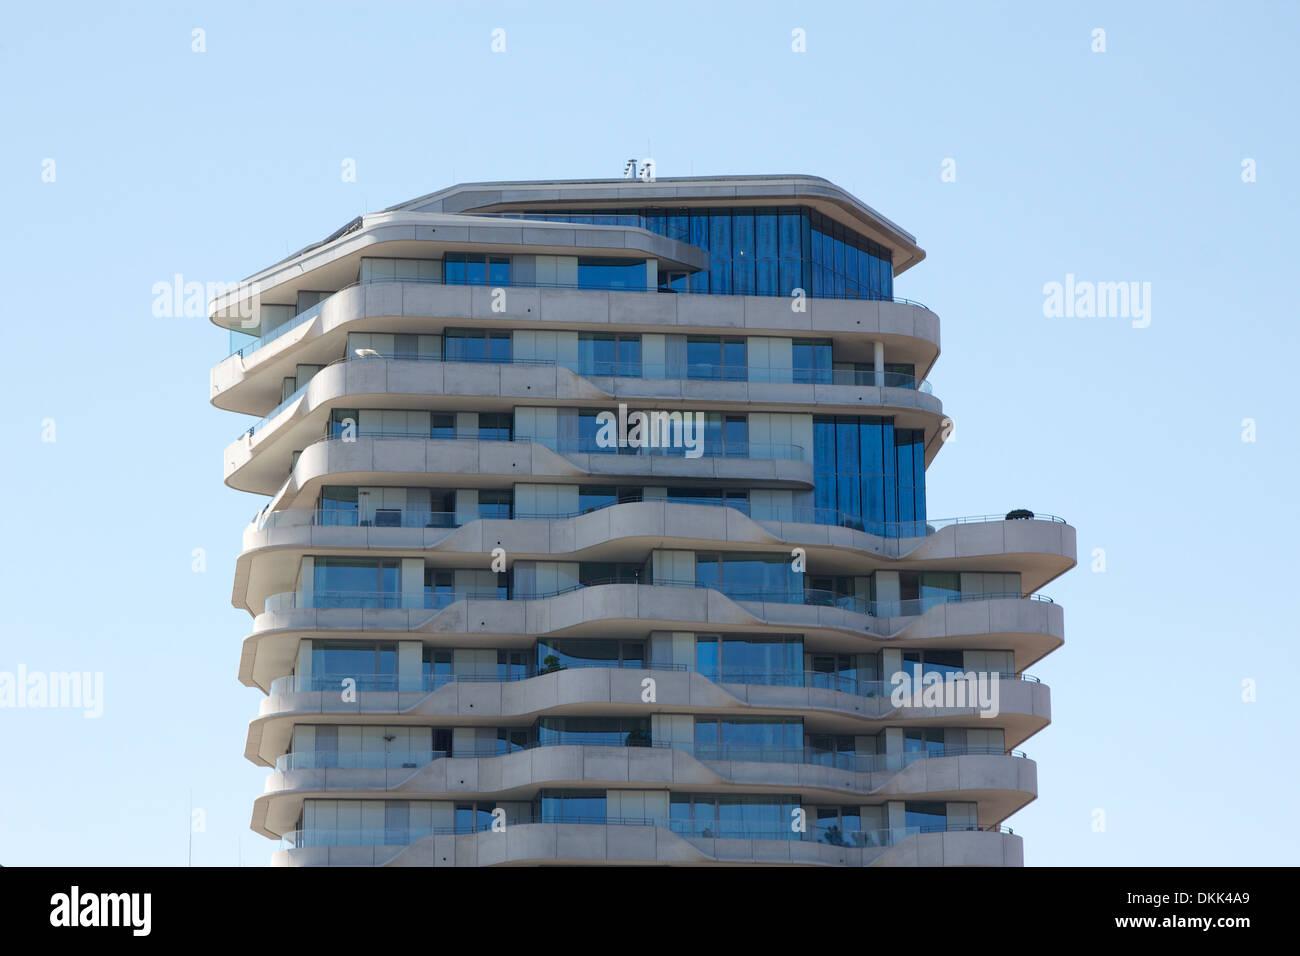 Penthouse of the landmark Marco-Polo-Tower luxury condominium in ...